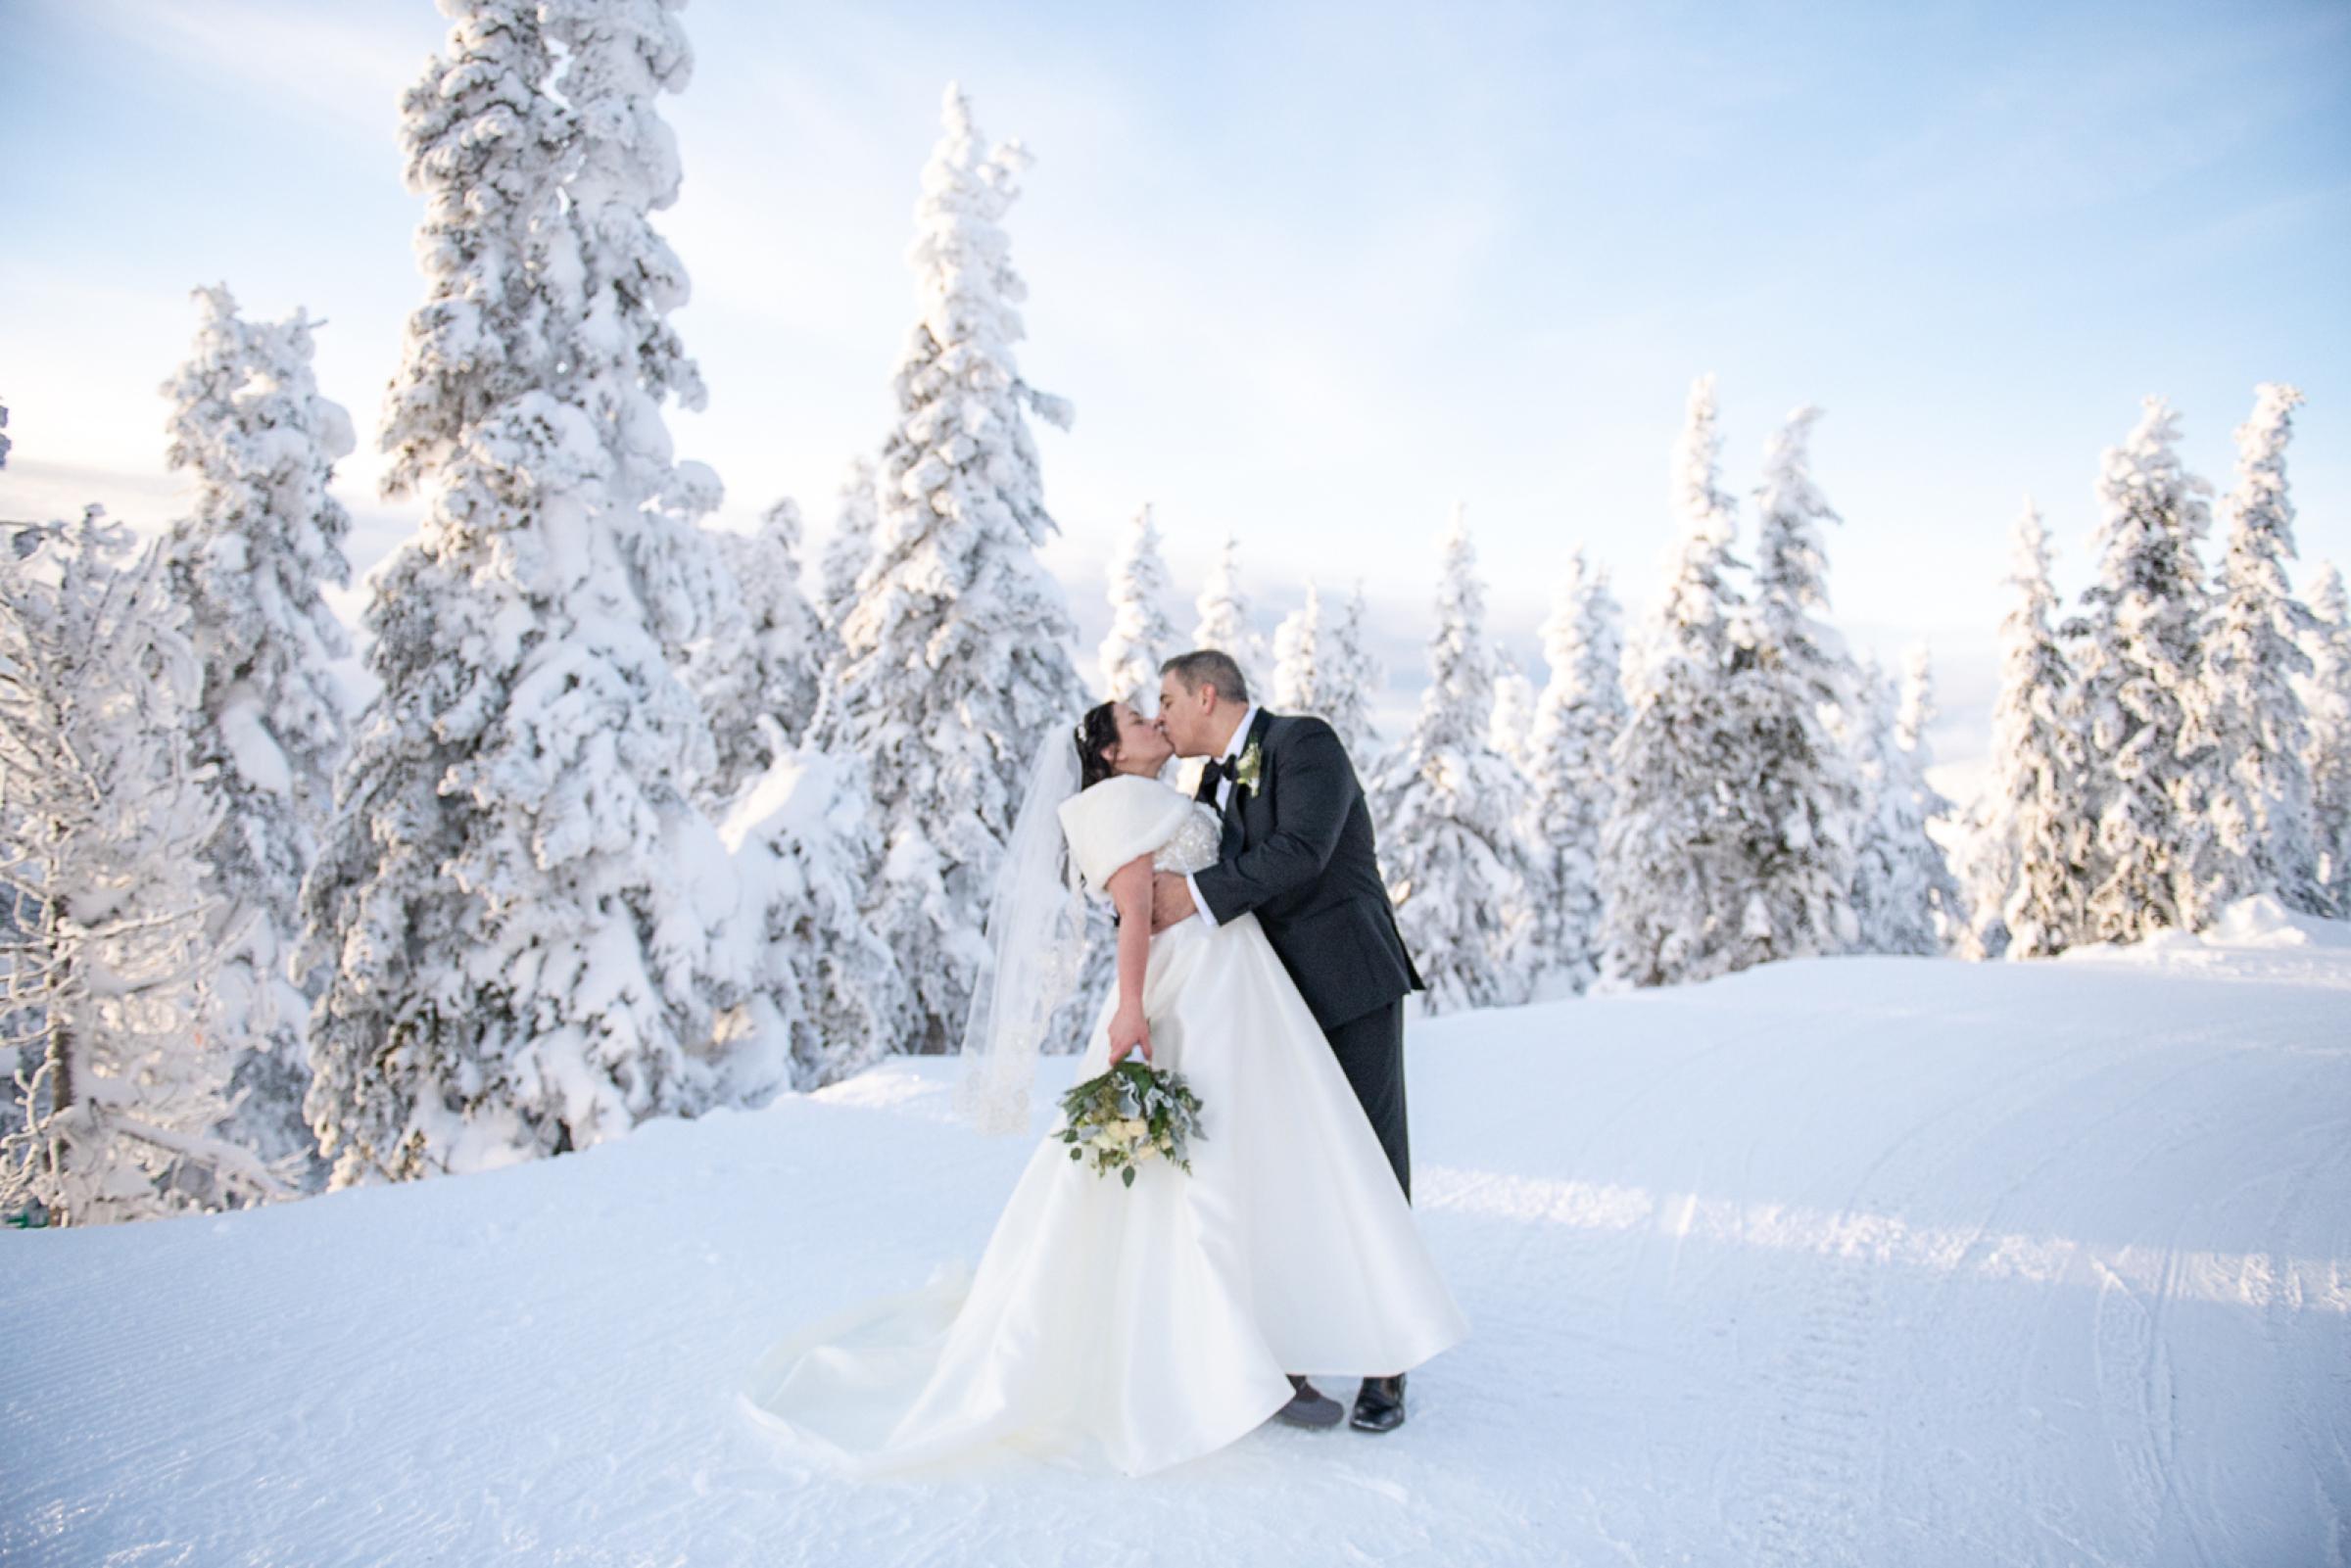 Janel-Gion-Wedding-Photographer-KristinRon-Sandpoint-Idaho.jpg_0022.jpg